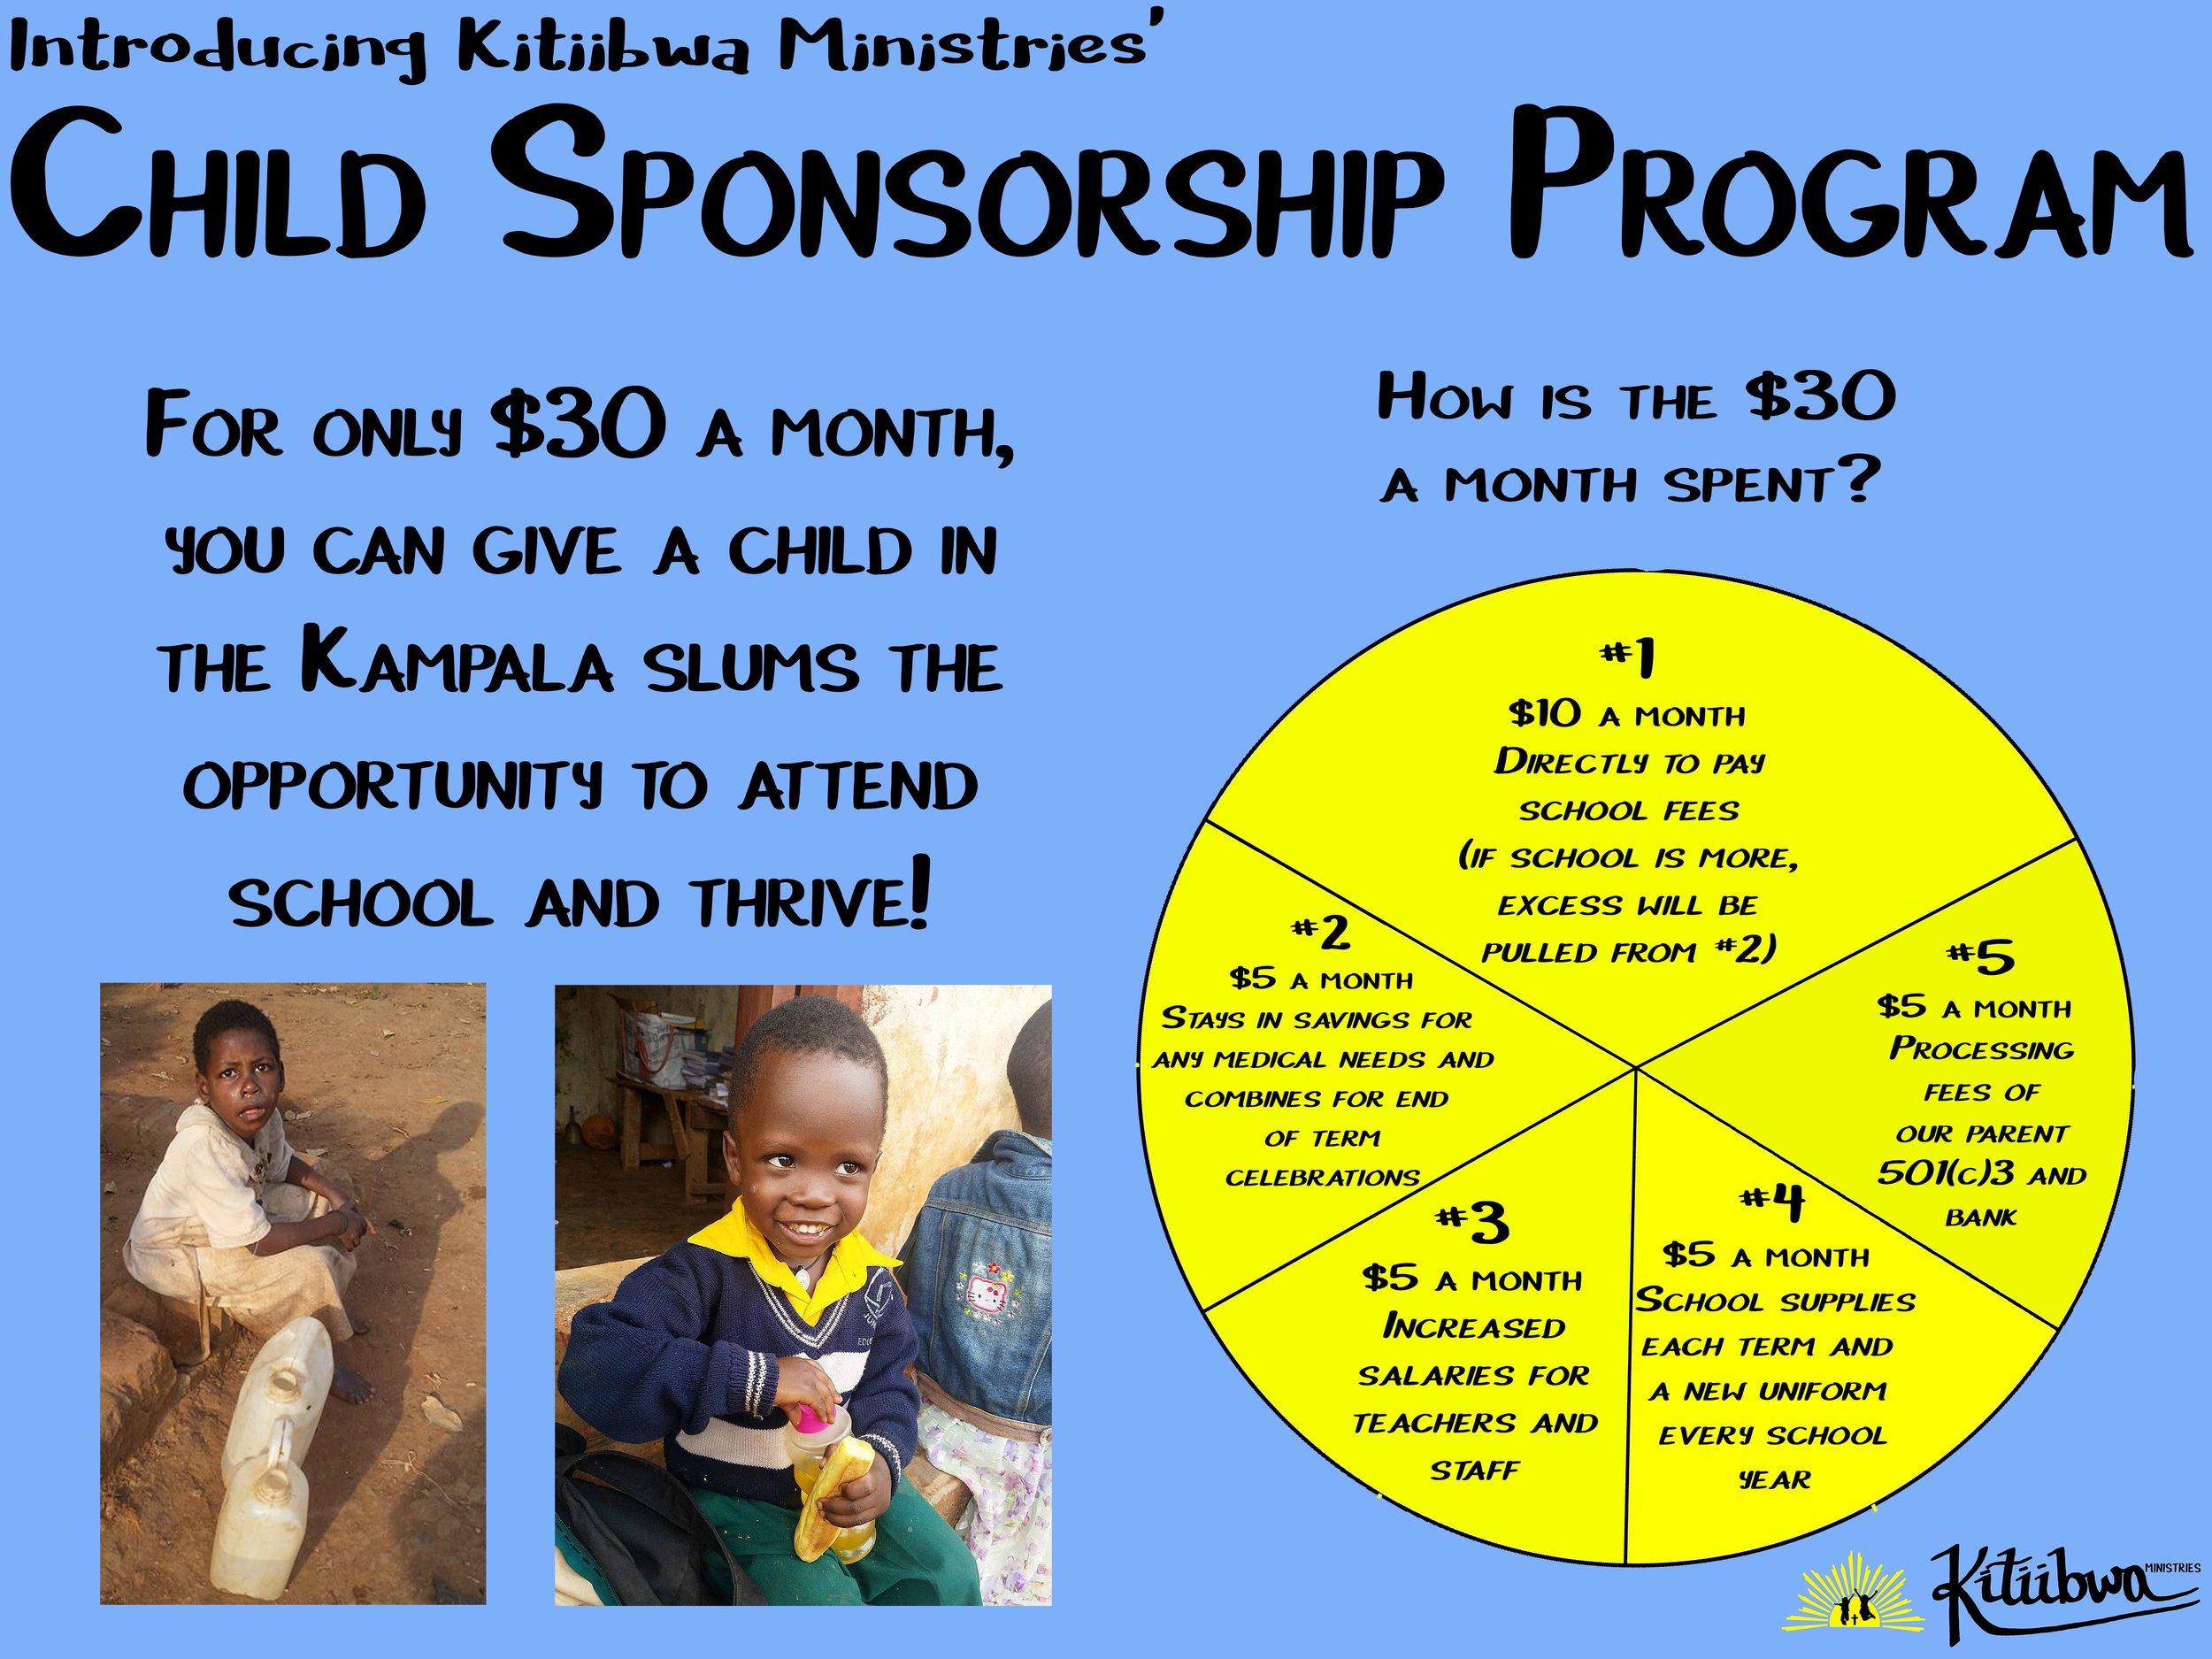 ChildSponsorshipsmall.jpg